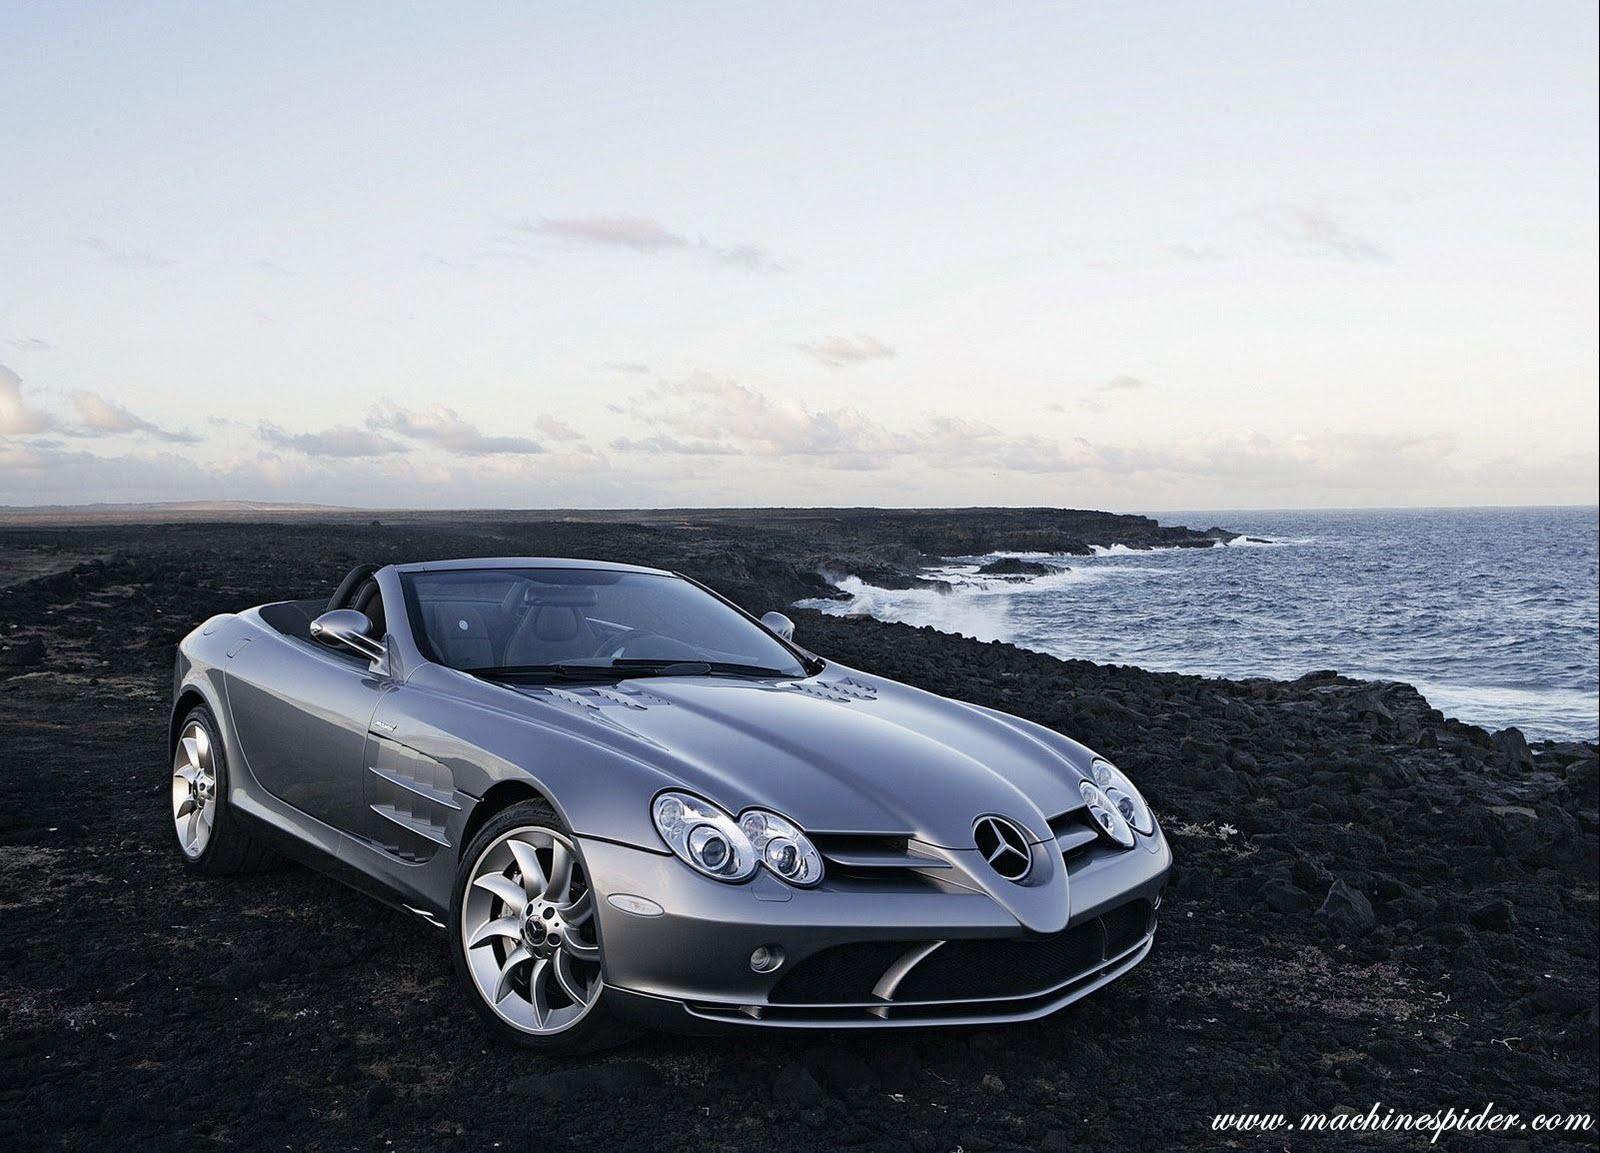 http://3.bp.blogspot.com/_HtriIY5et8U/TDGXp0O03ZI/AAAAAAAABX8/ORGuggdR0Ng/s1600/Mercedes-Benz-SLR_McLaren_Roadster_2008_1600x1200_wallpaper_01.jpg